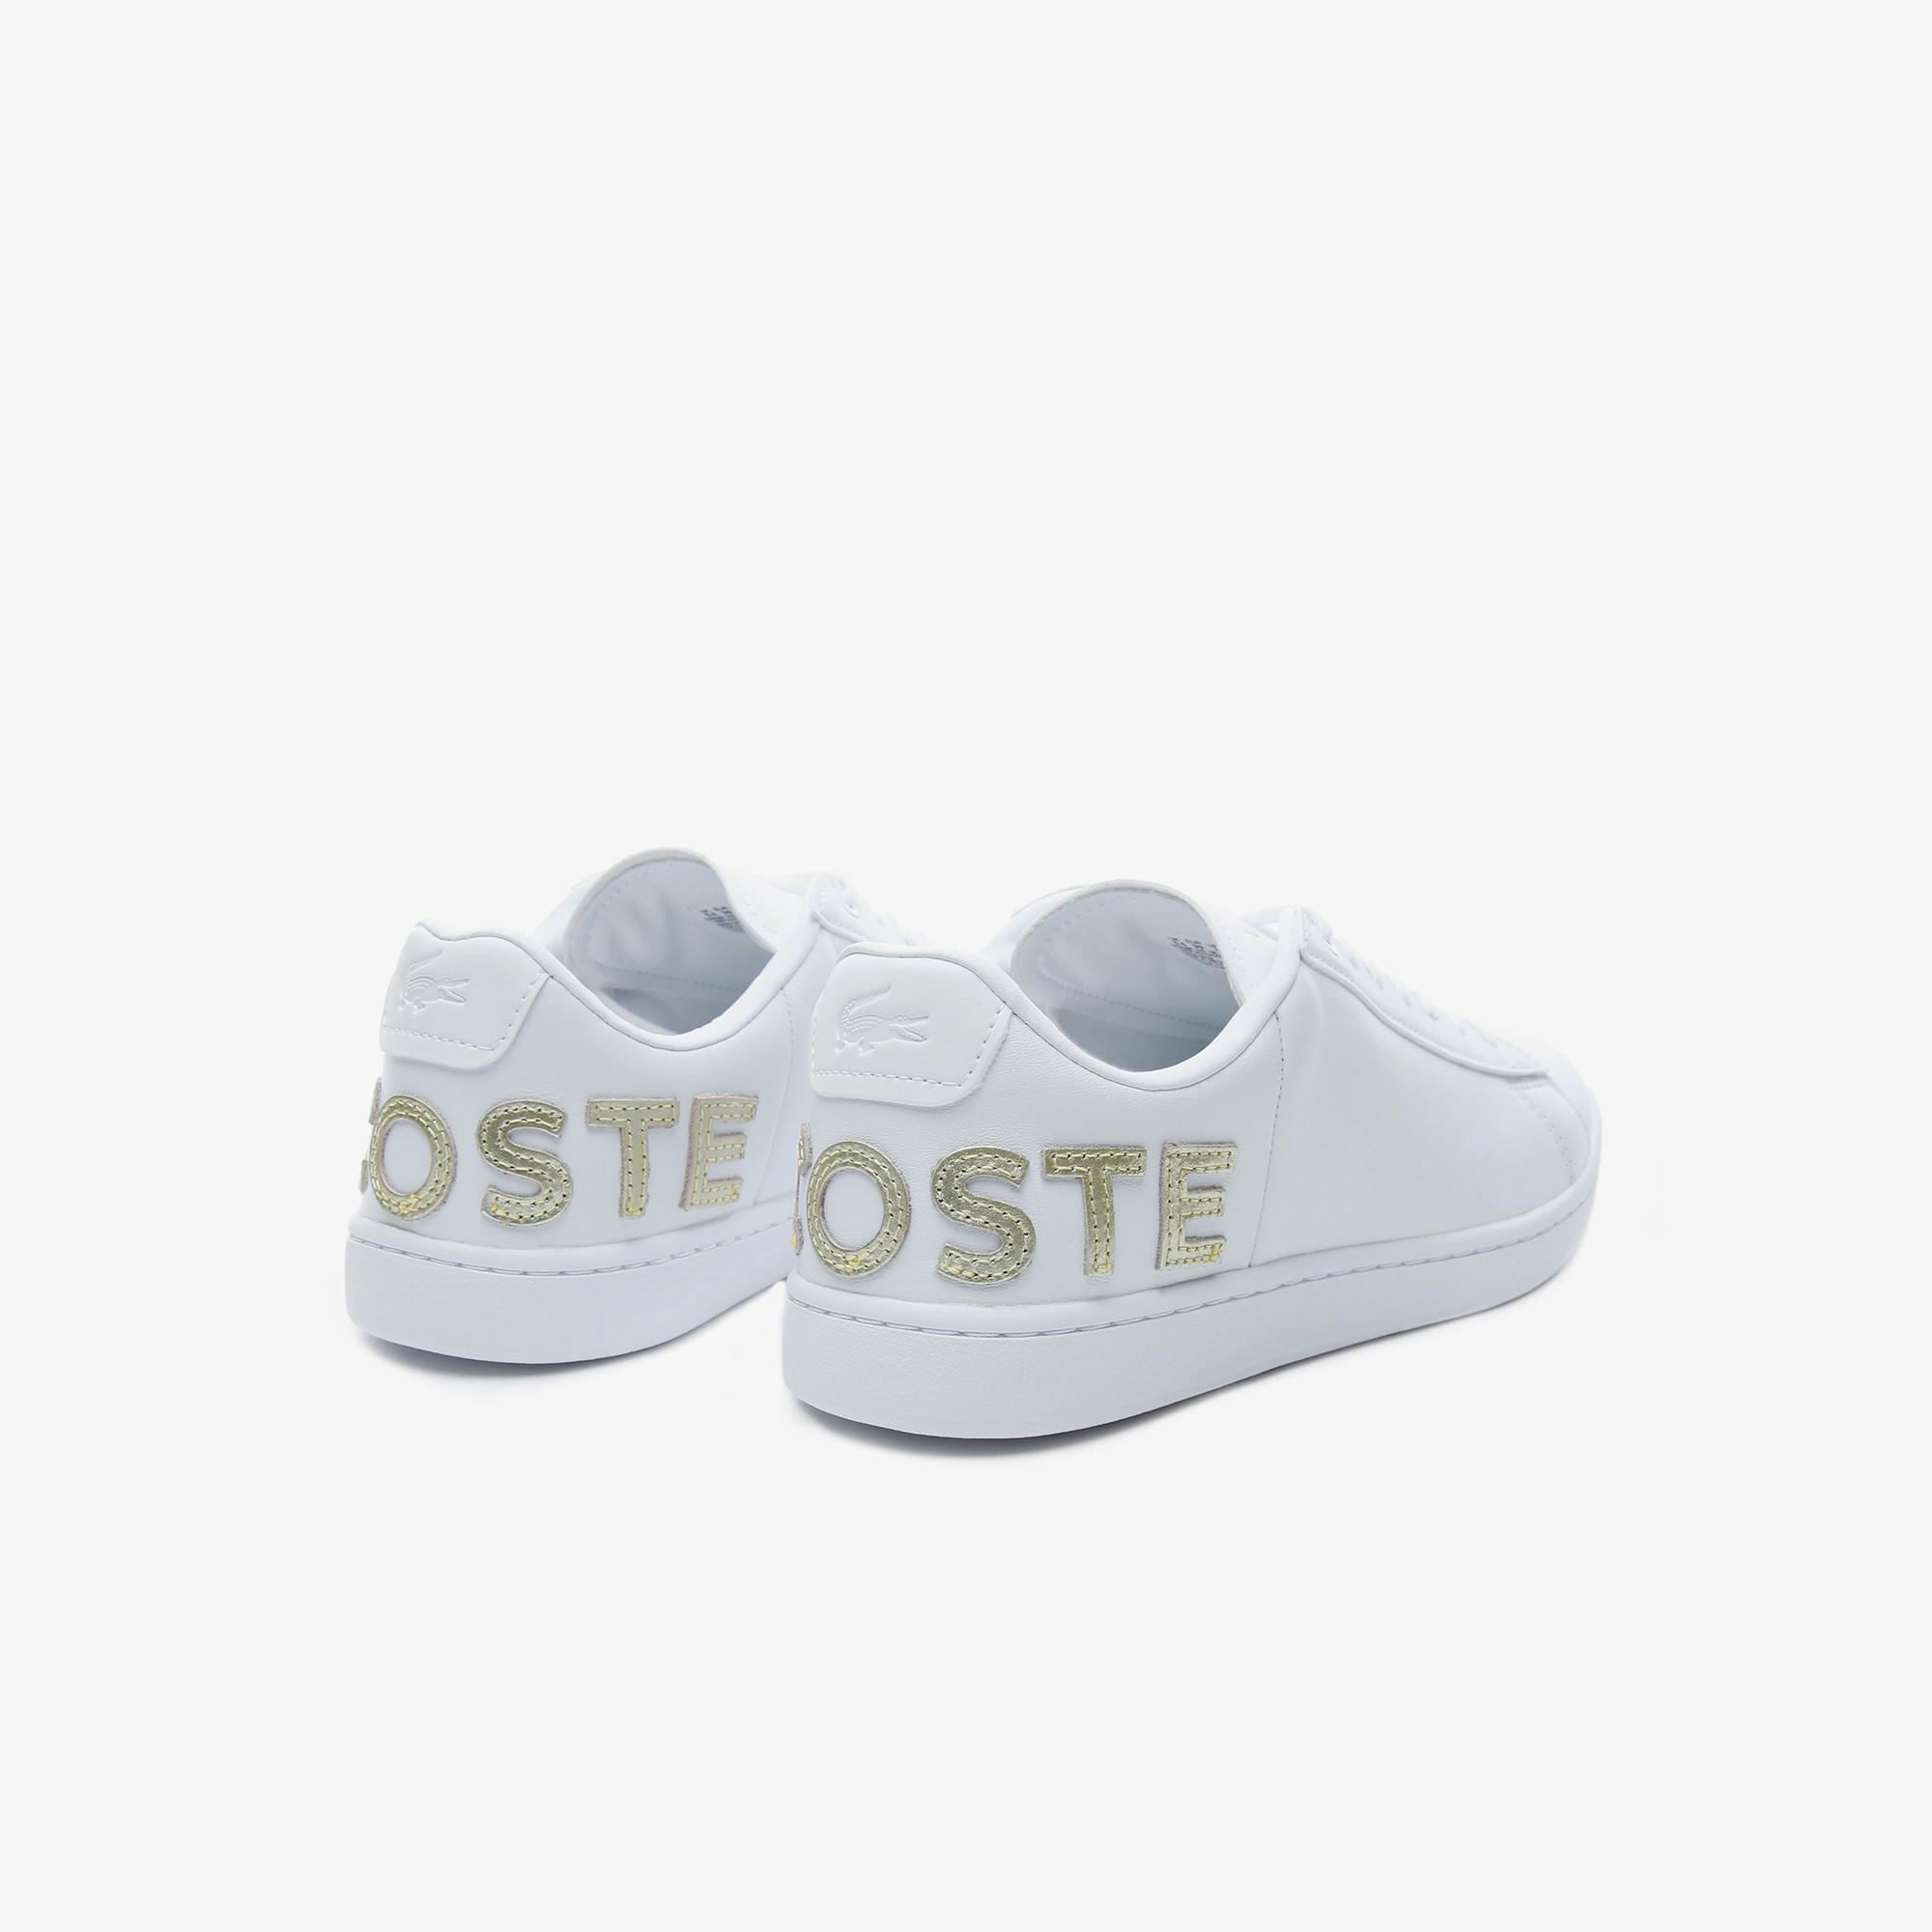 Lacoste Women's Carnaby Evo 120 6 Us Sfa Leather Sneakers